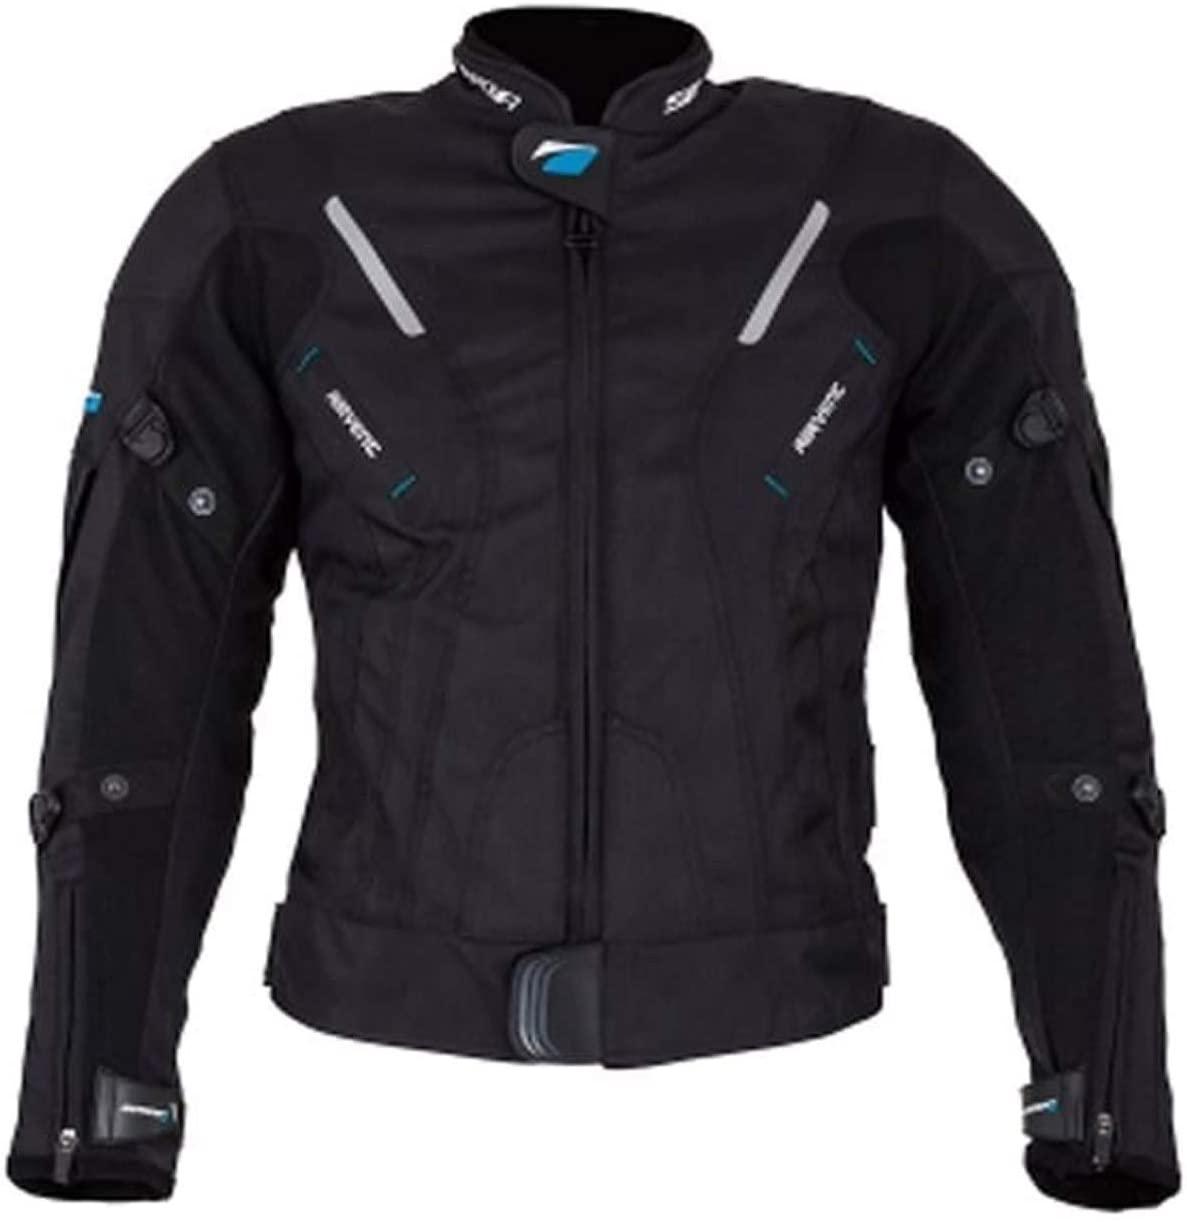 Spada Curve Waterproof Textile Motorcycle Jacket - Black XXL